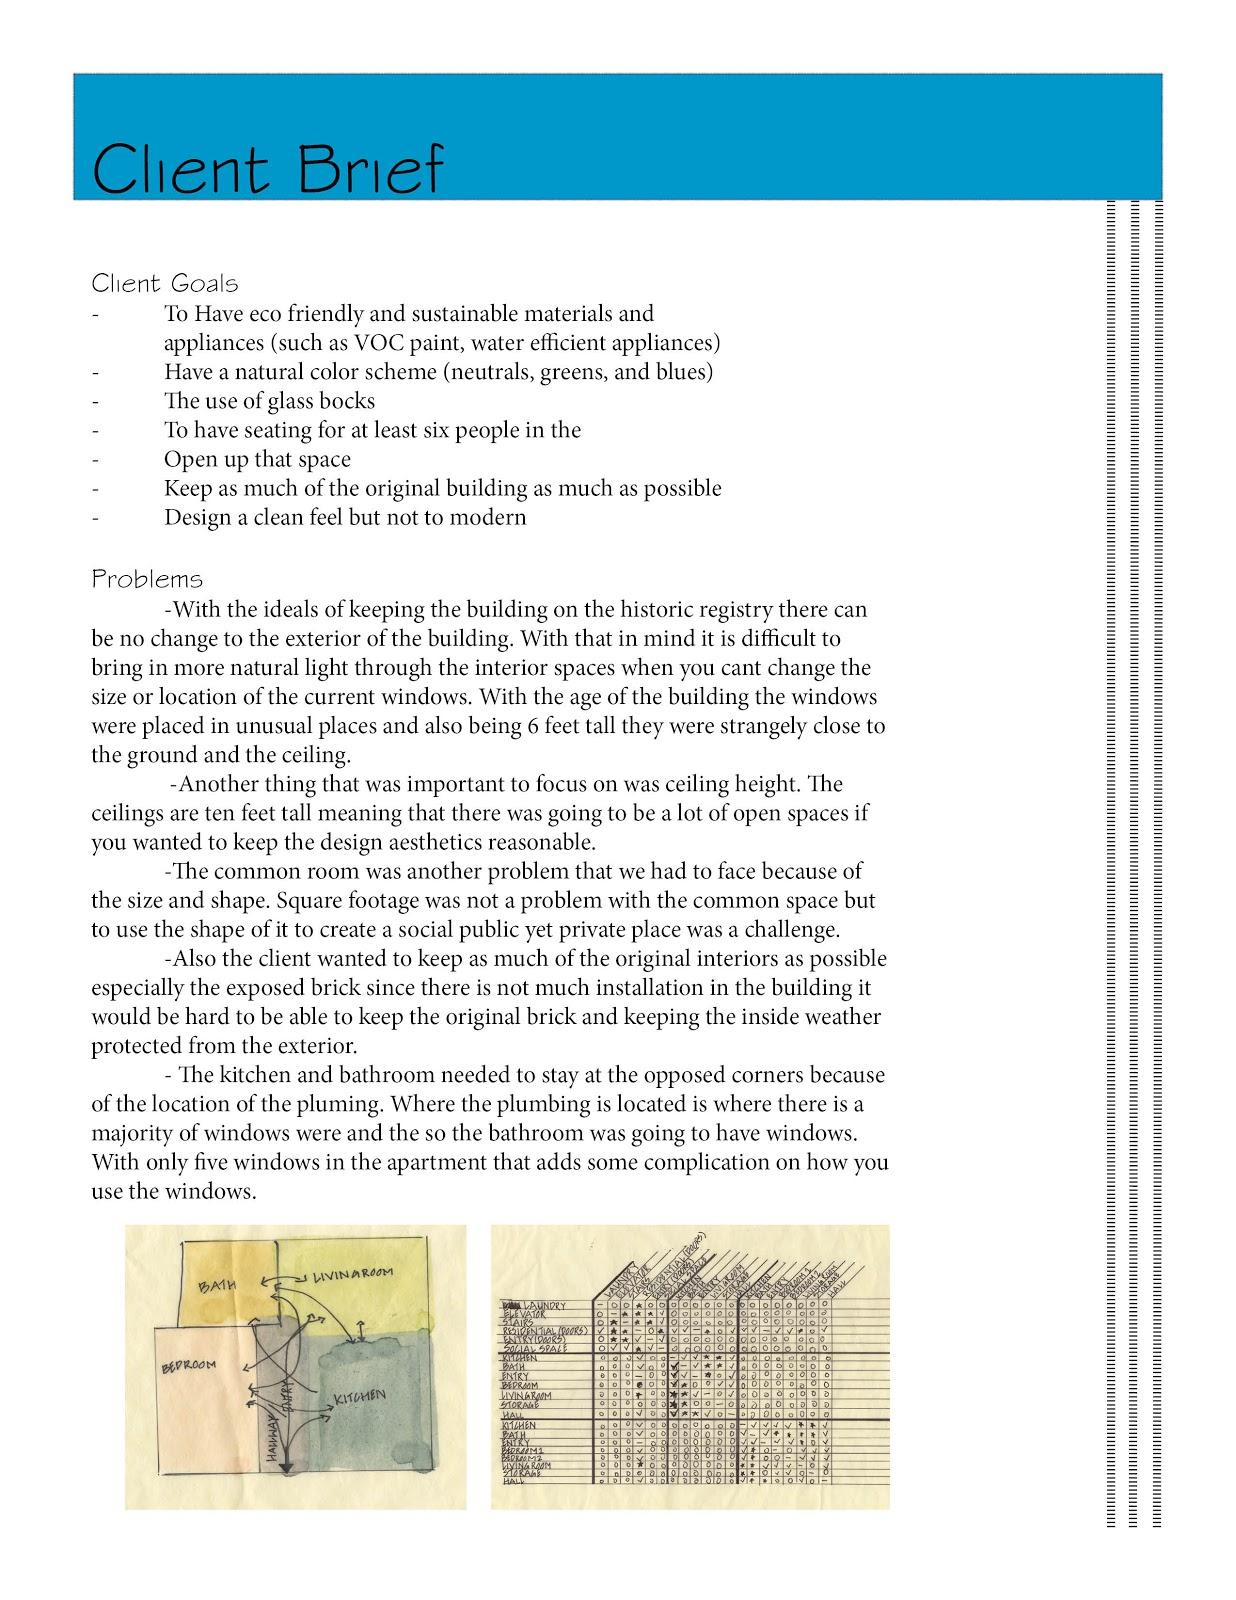 Home Design Client Questionnaire Michelle Hanna Interior Design Portfolio Client Brief